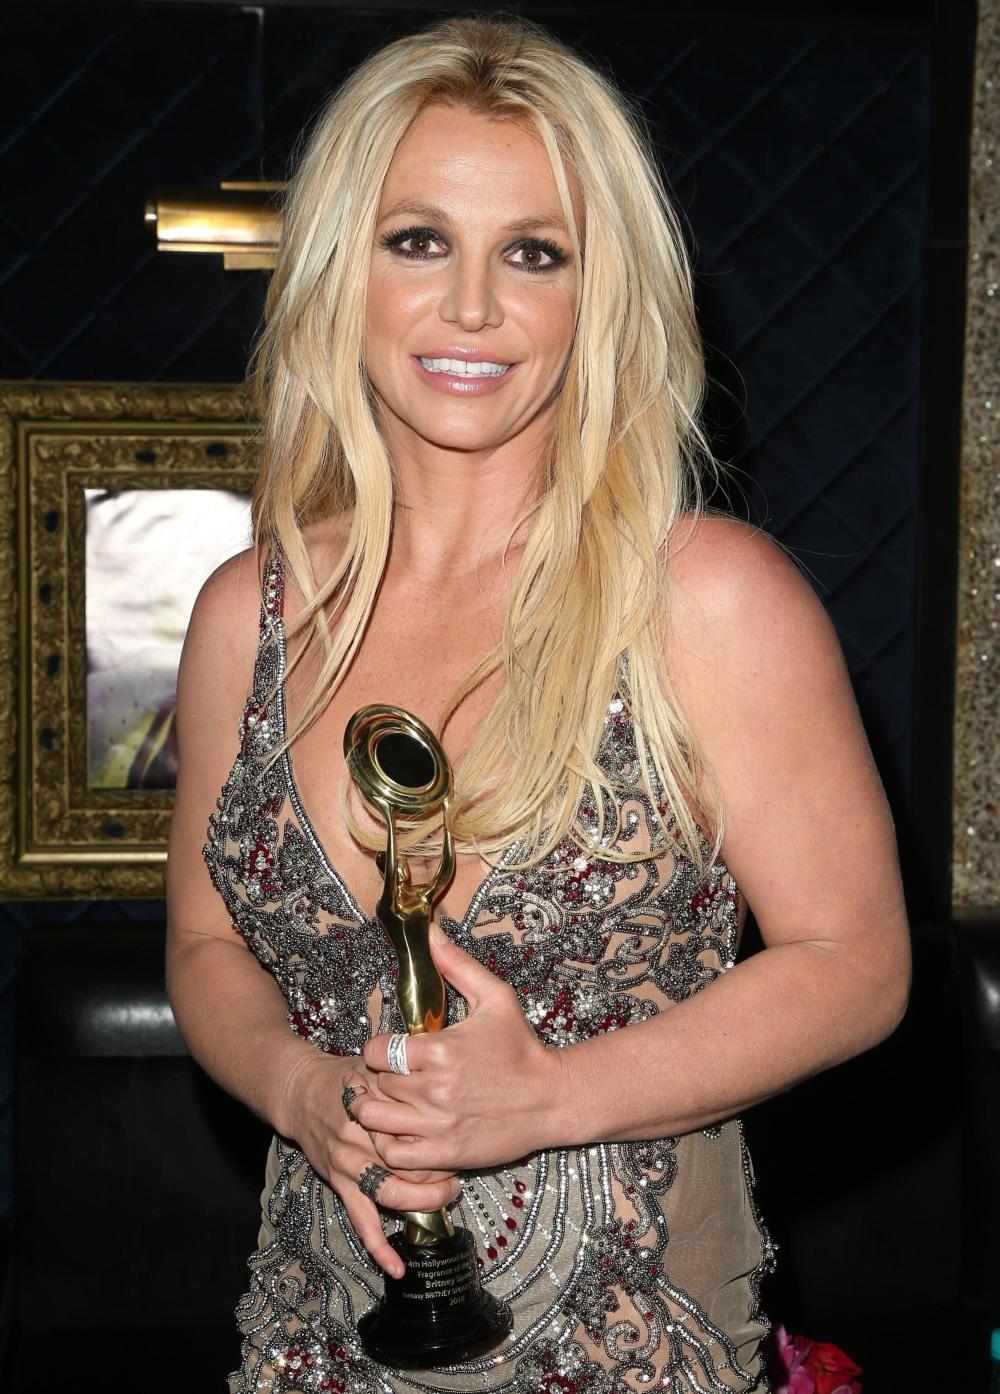 The 4th Annual Hollywood Beauty Awards